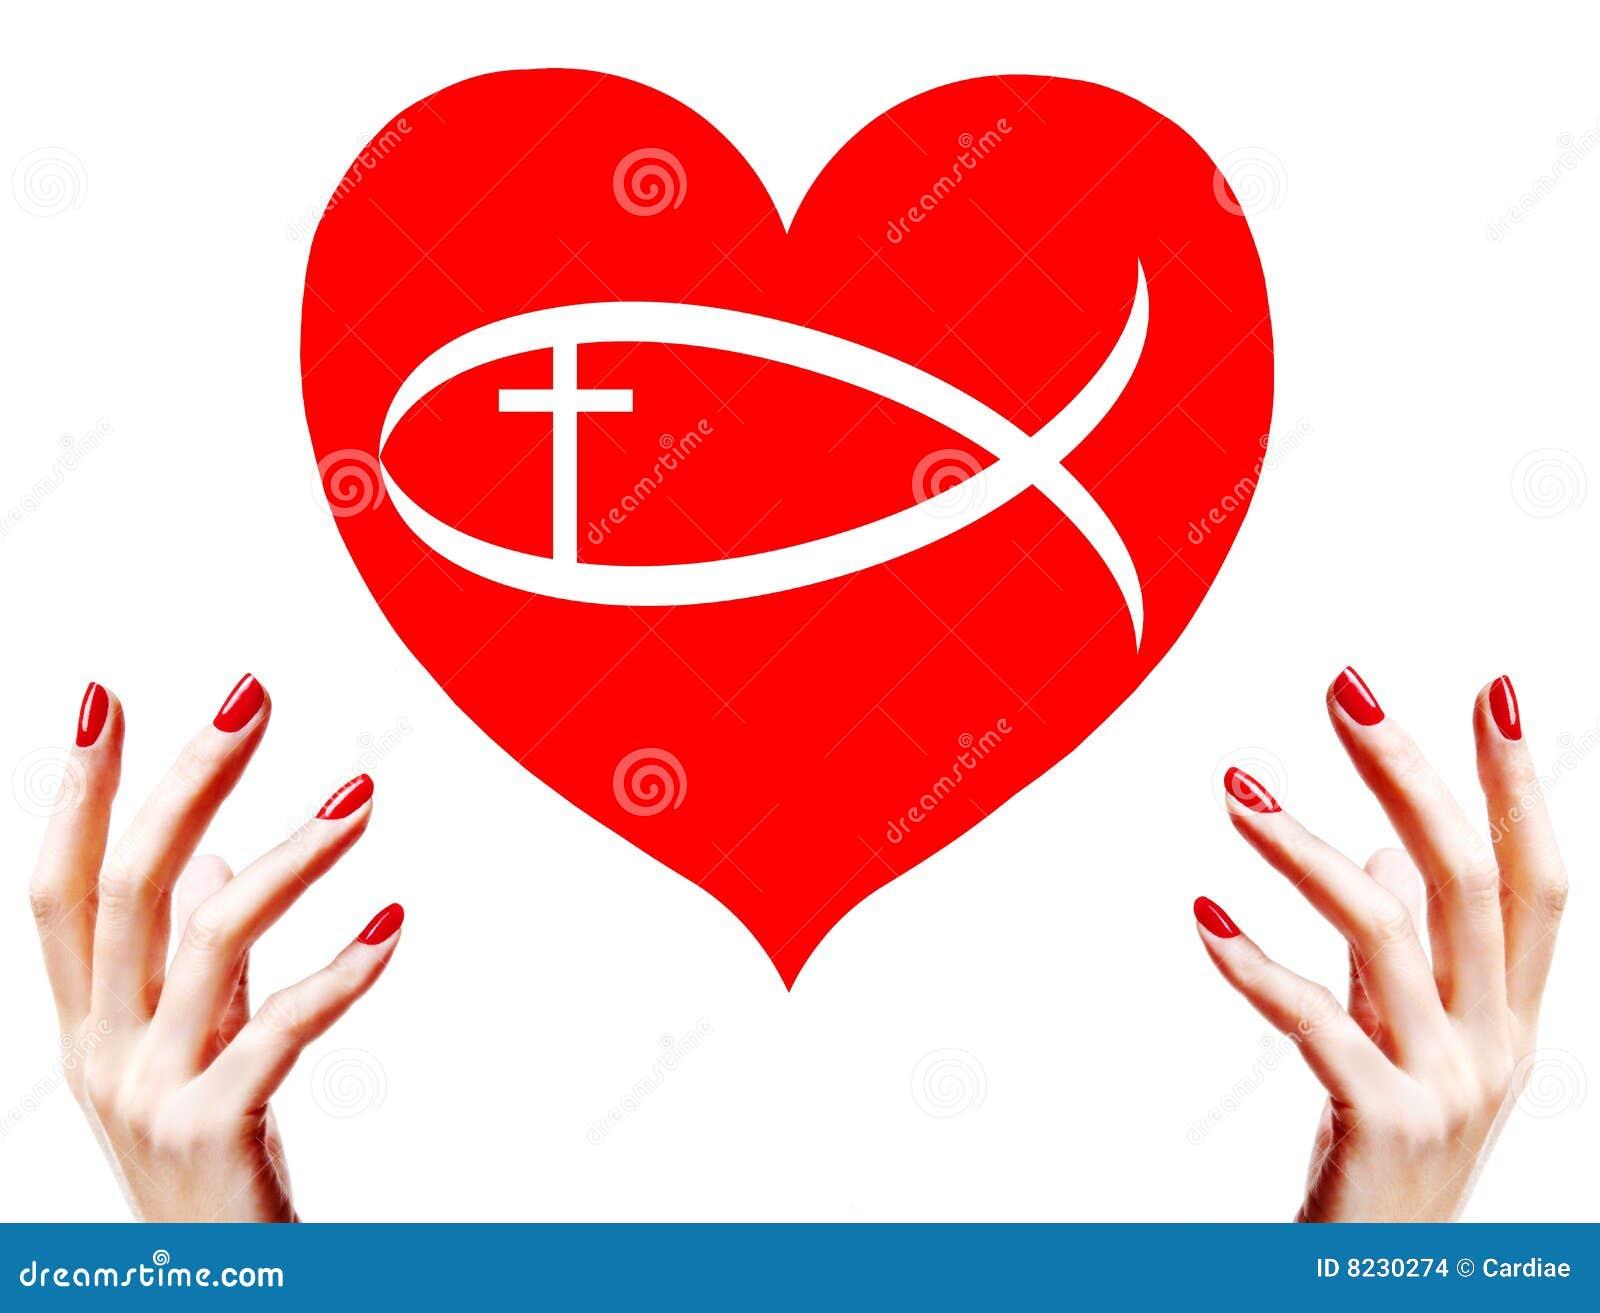 Christian Love Red Heart Sign Symbol Stock Illustrations 110